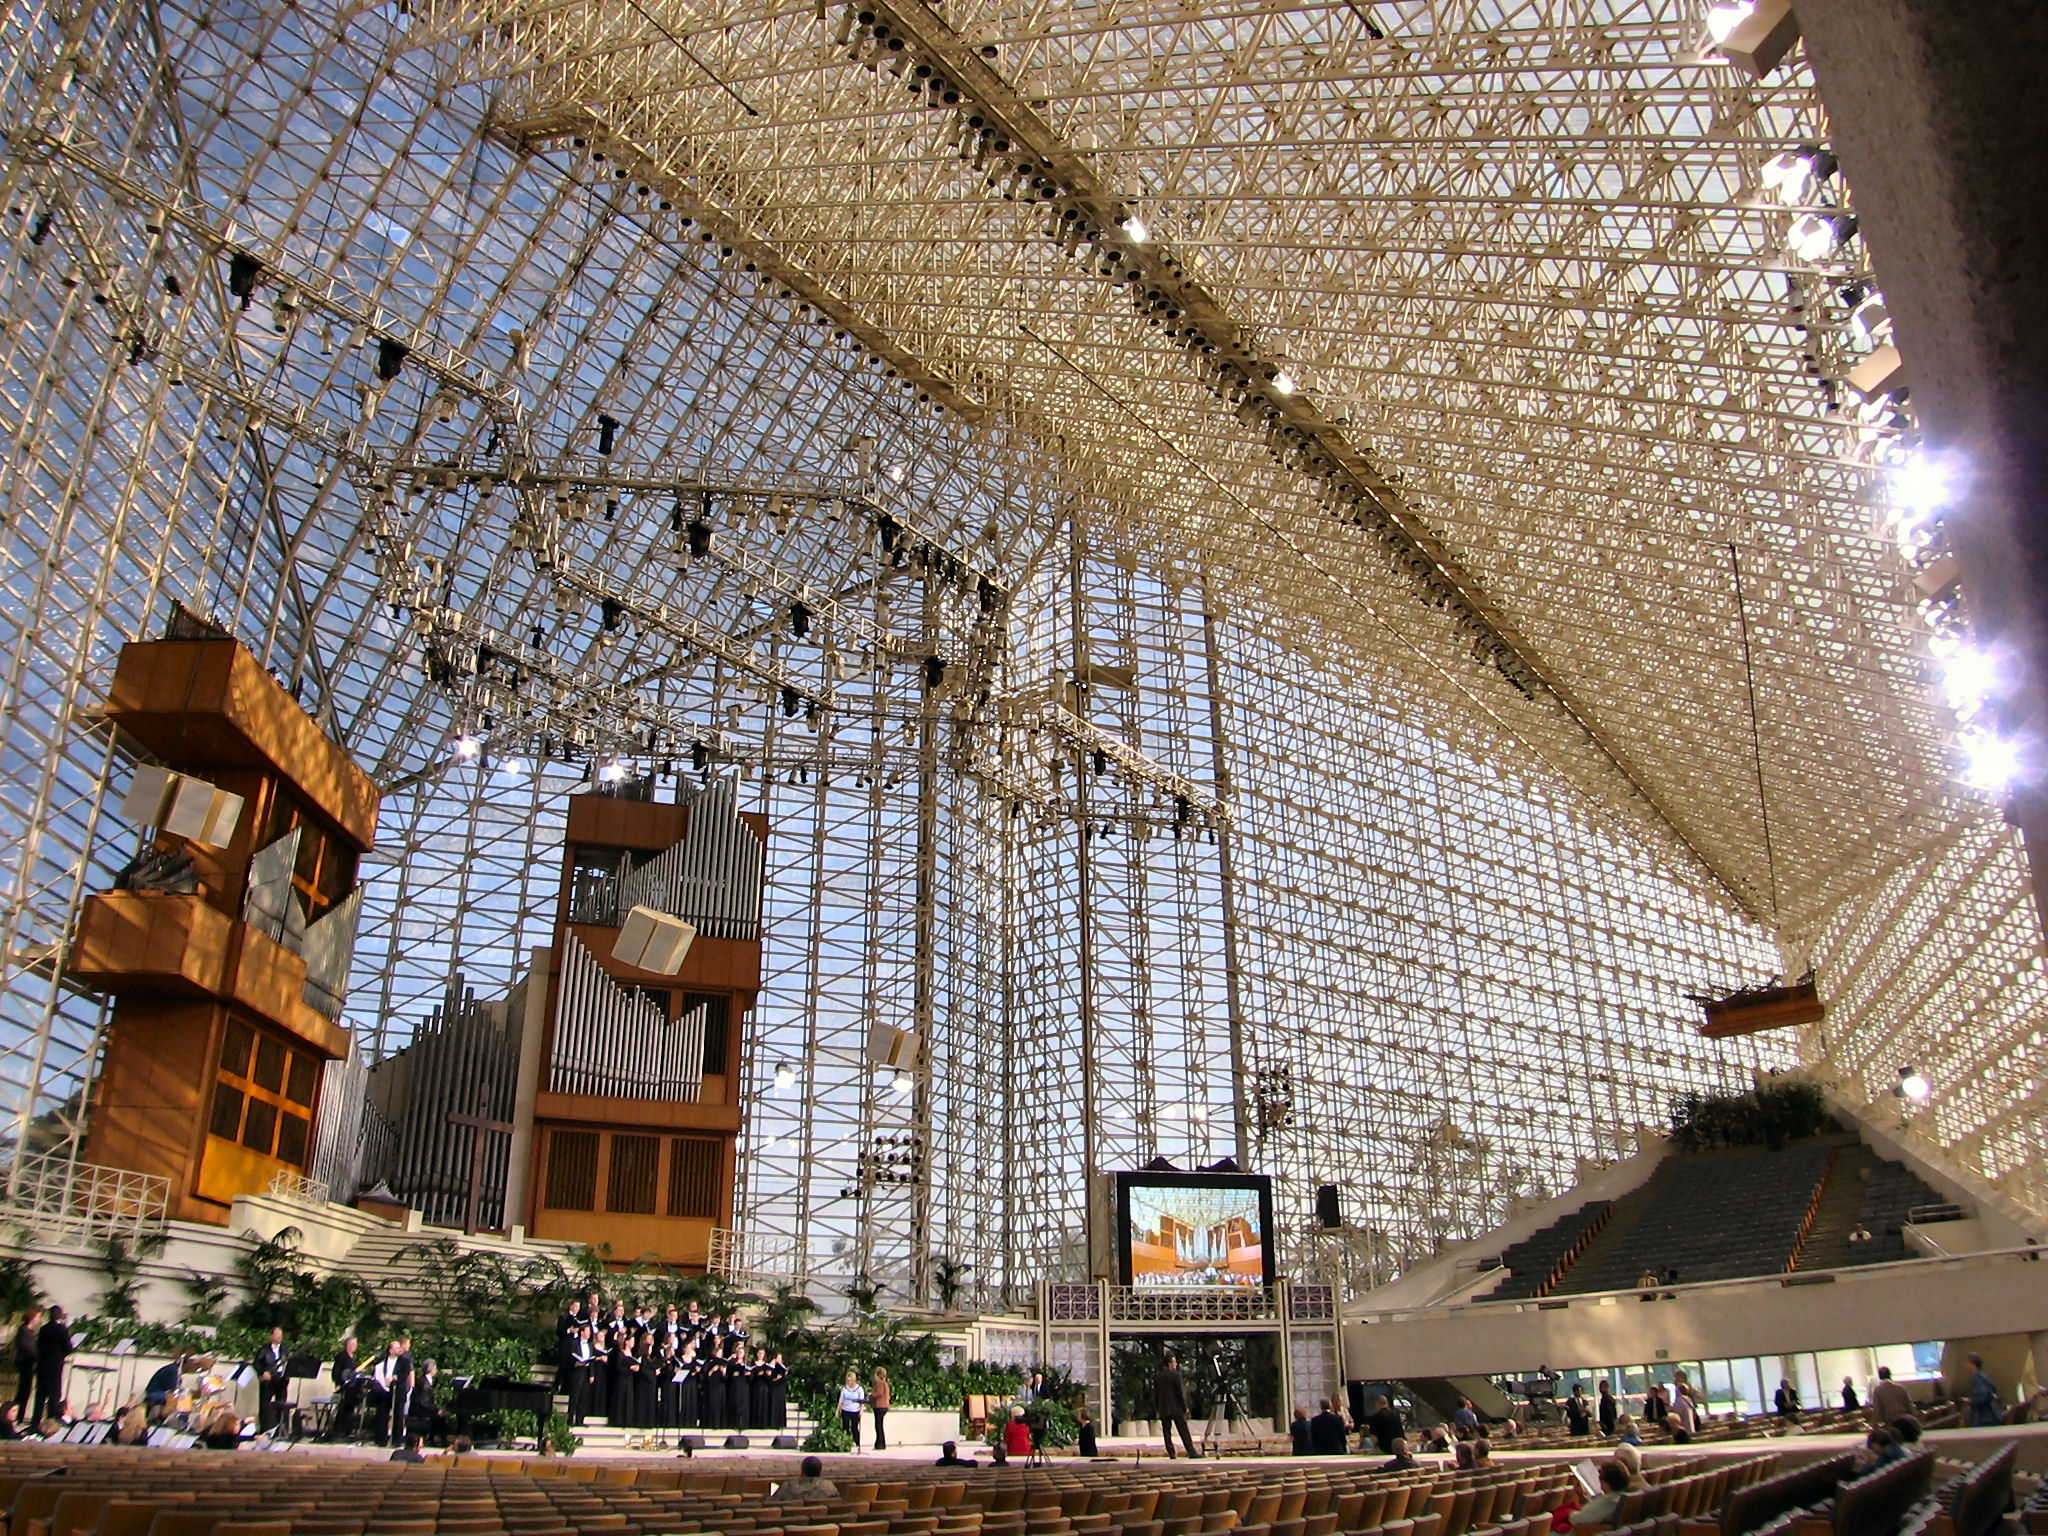 Crystal Church Christmas 2020 California Christ Cathedral (Garden Grove, California)   Wikipedia